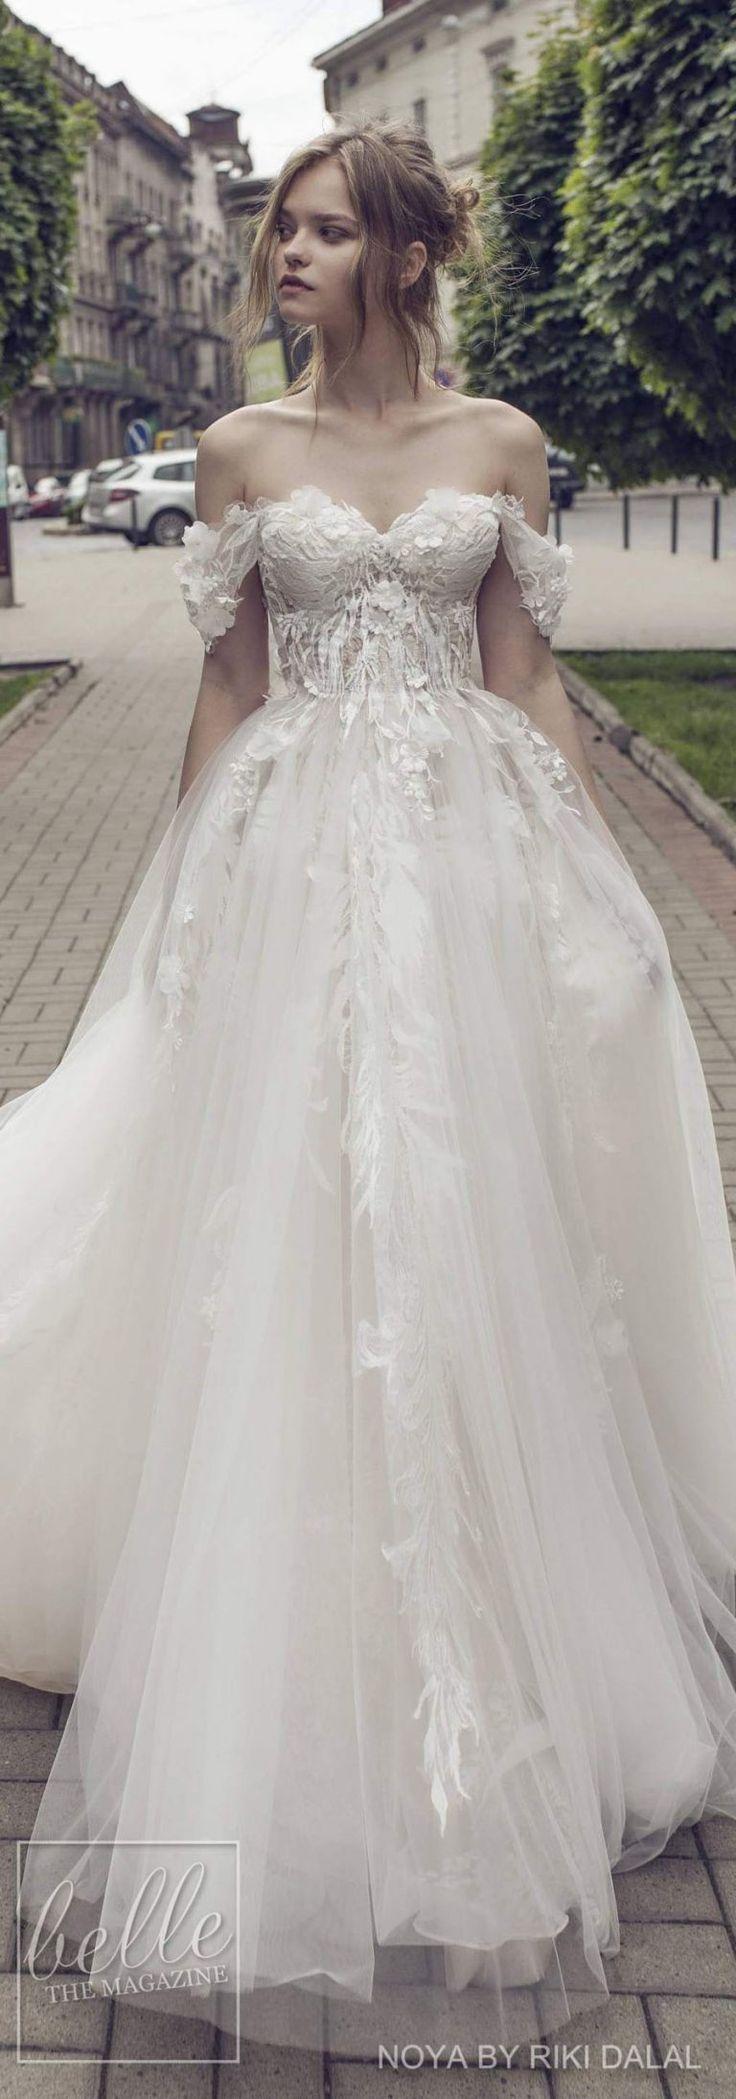 Noya by Riki Dalal Bridal 2018 Shakespeare Collection | off the shoulder wedding dress ballgown with sweetheart neckline #weddingdress #weddingdresses #bridalgown #bridal #bridalgowns #bride #bridetobe #weddinginspiration #weddingideas #weddings